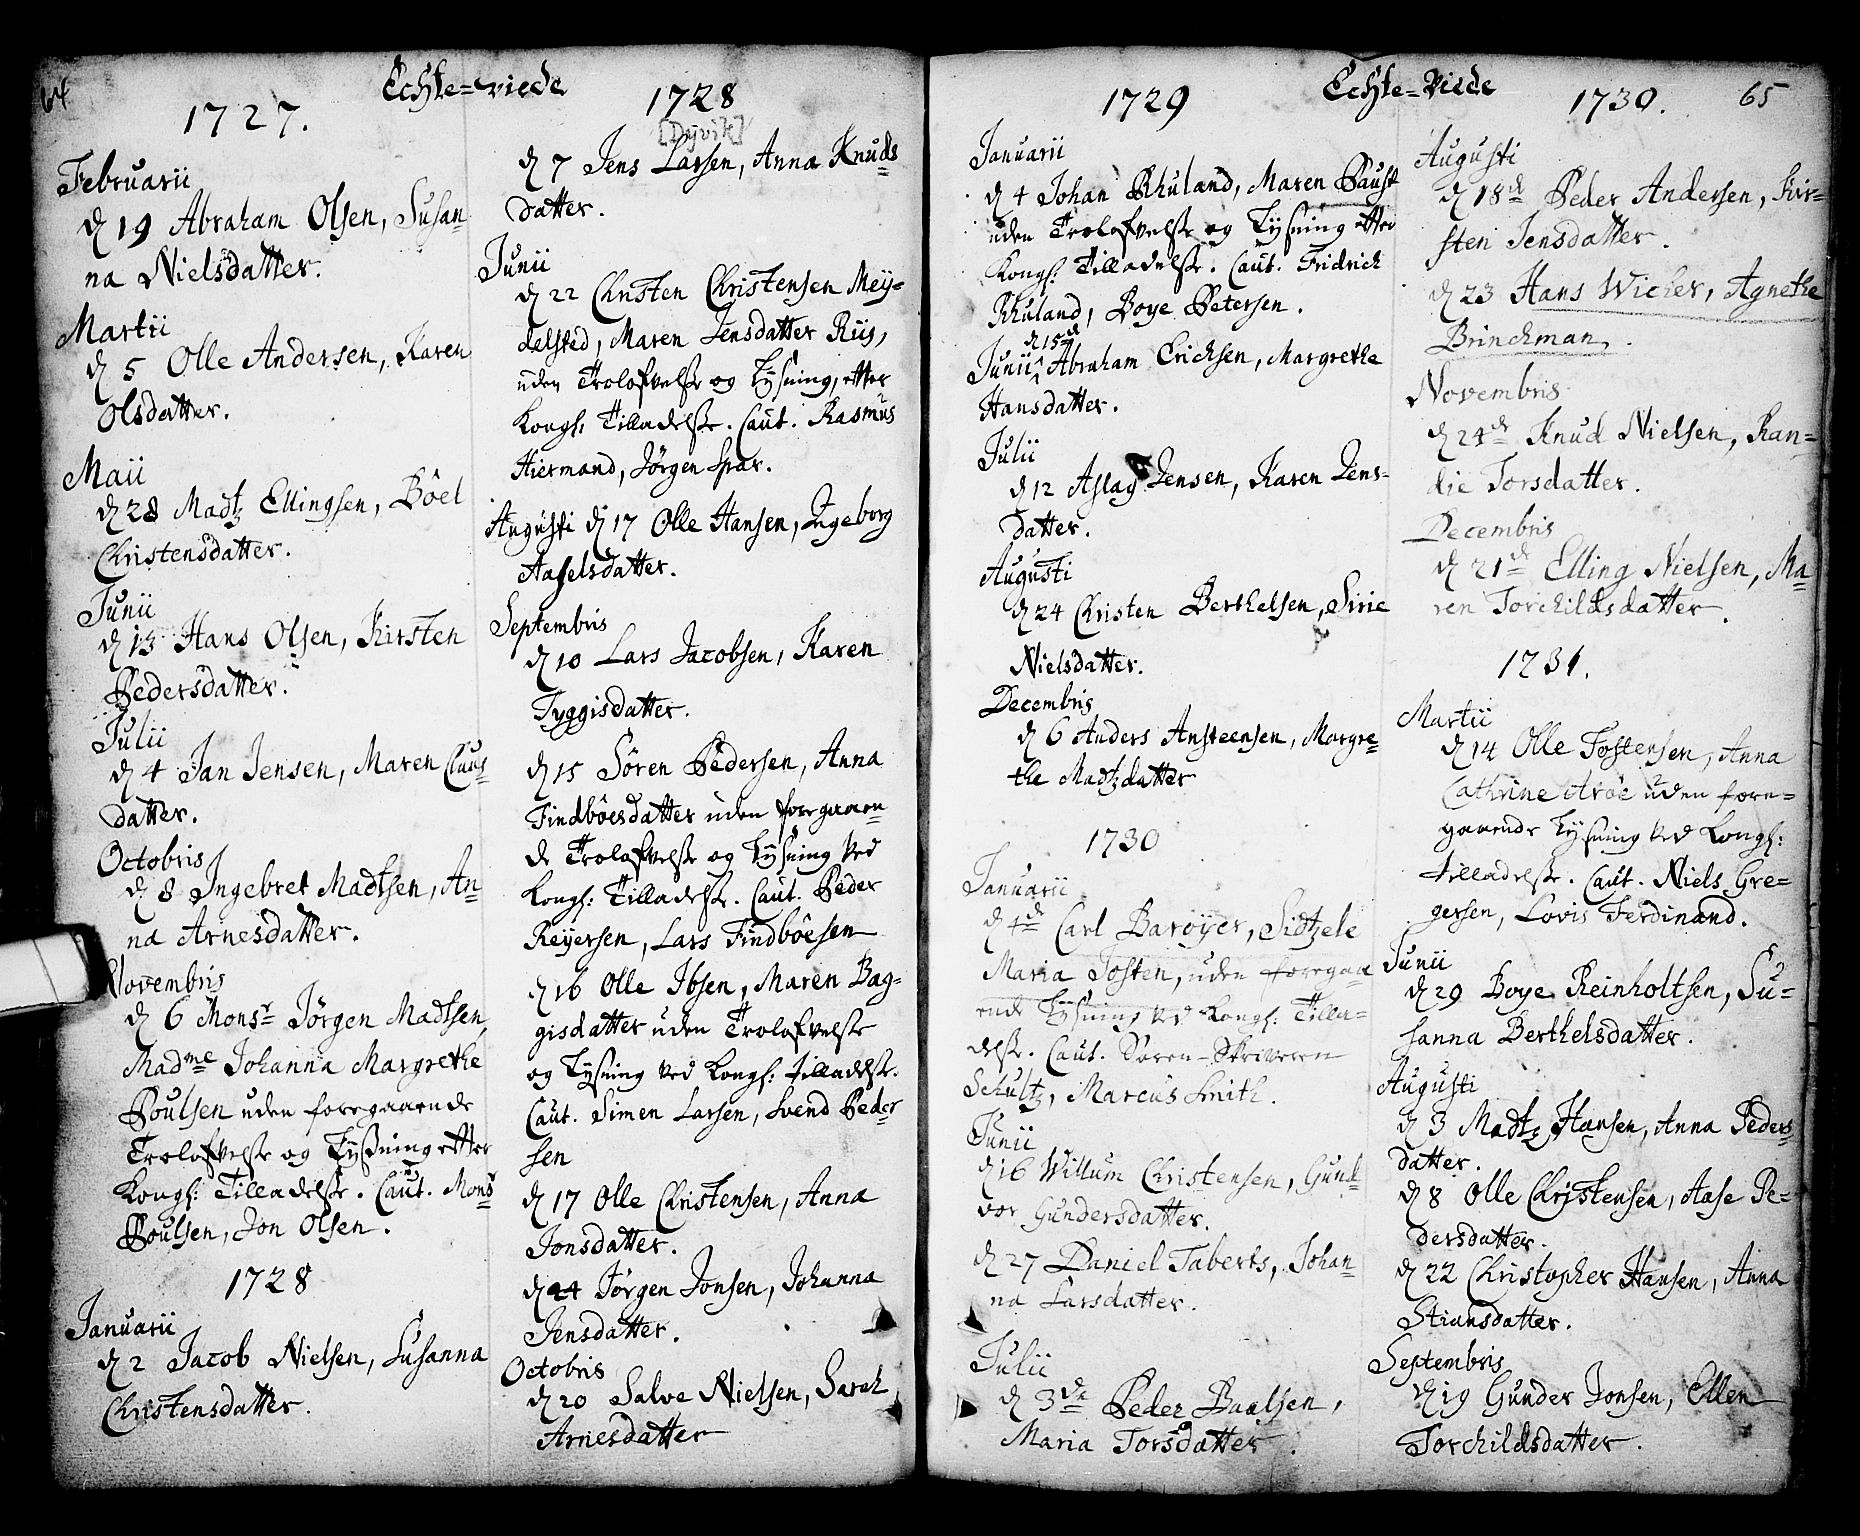 SAKO, Kragerø kirkebøker, F/Fa/L0001: Ministerialbok nr. 1, 1702-1766, s. 64-65